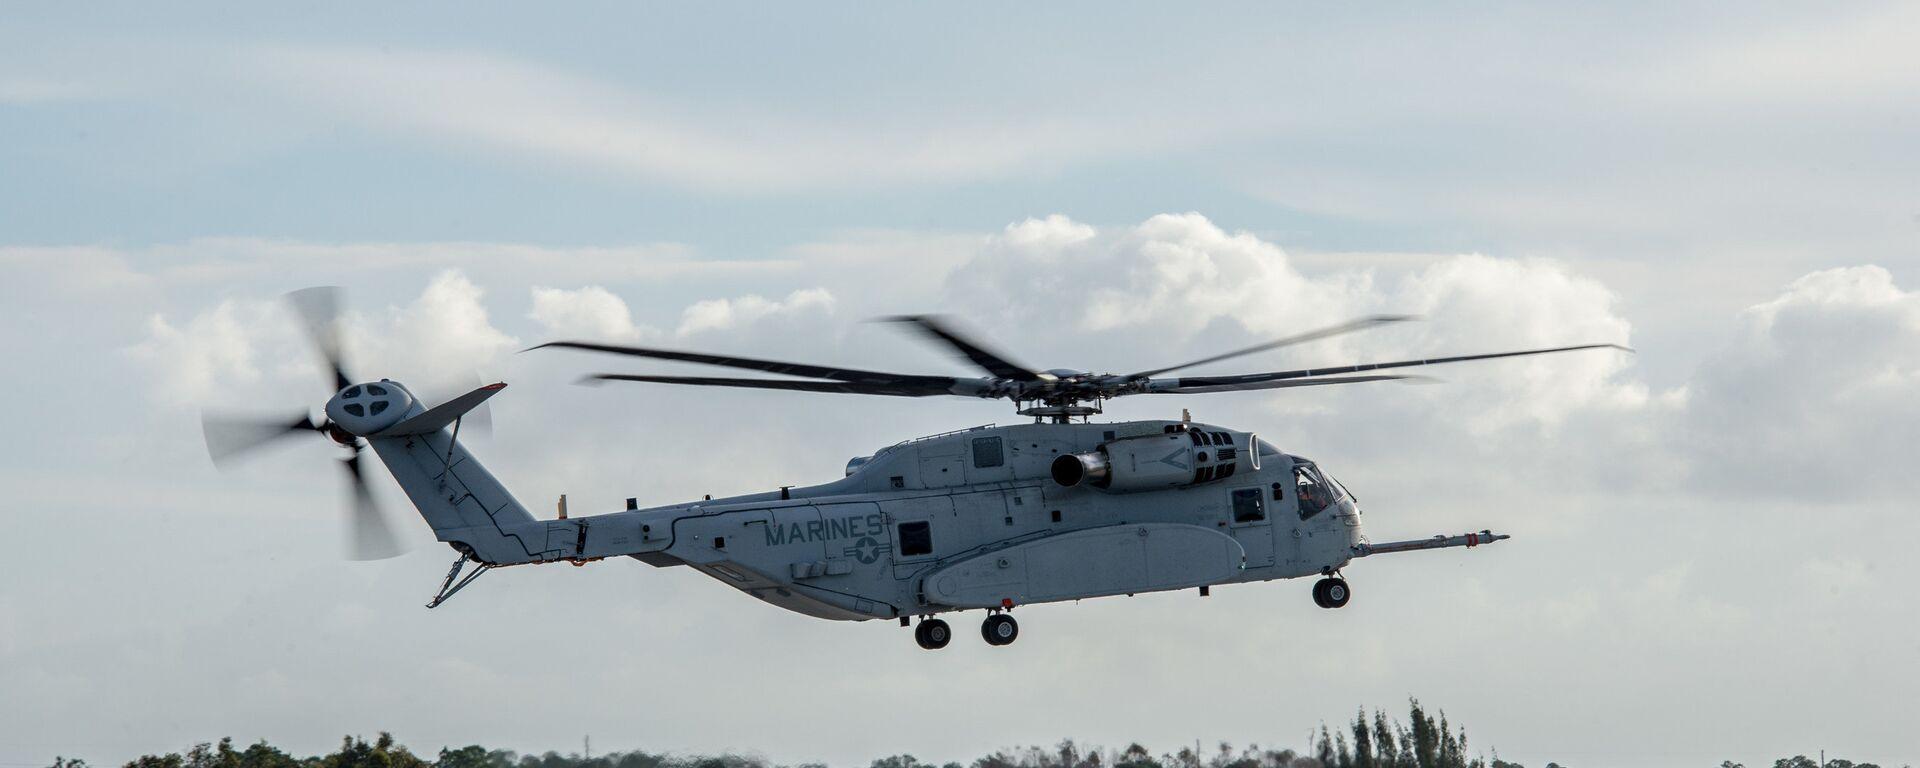 Elicottero americano Sikorsky CH-53K - Sputnik Italia, 1920, 31.07.2021